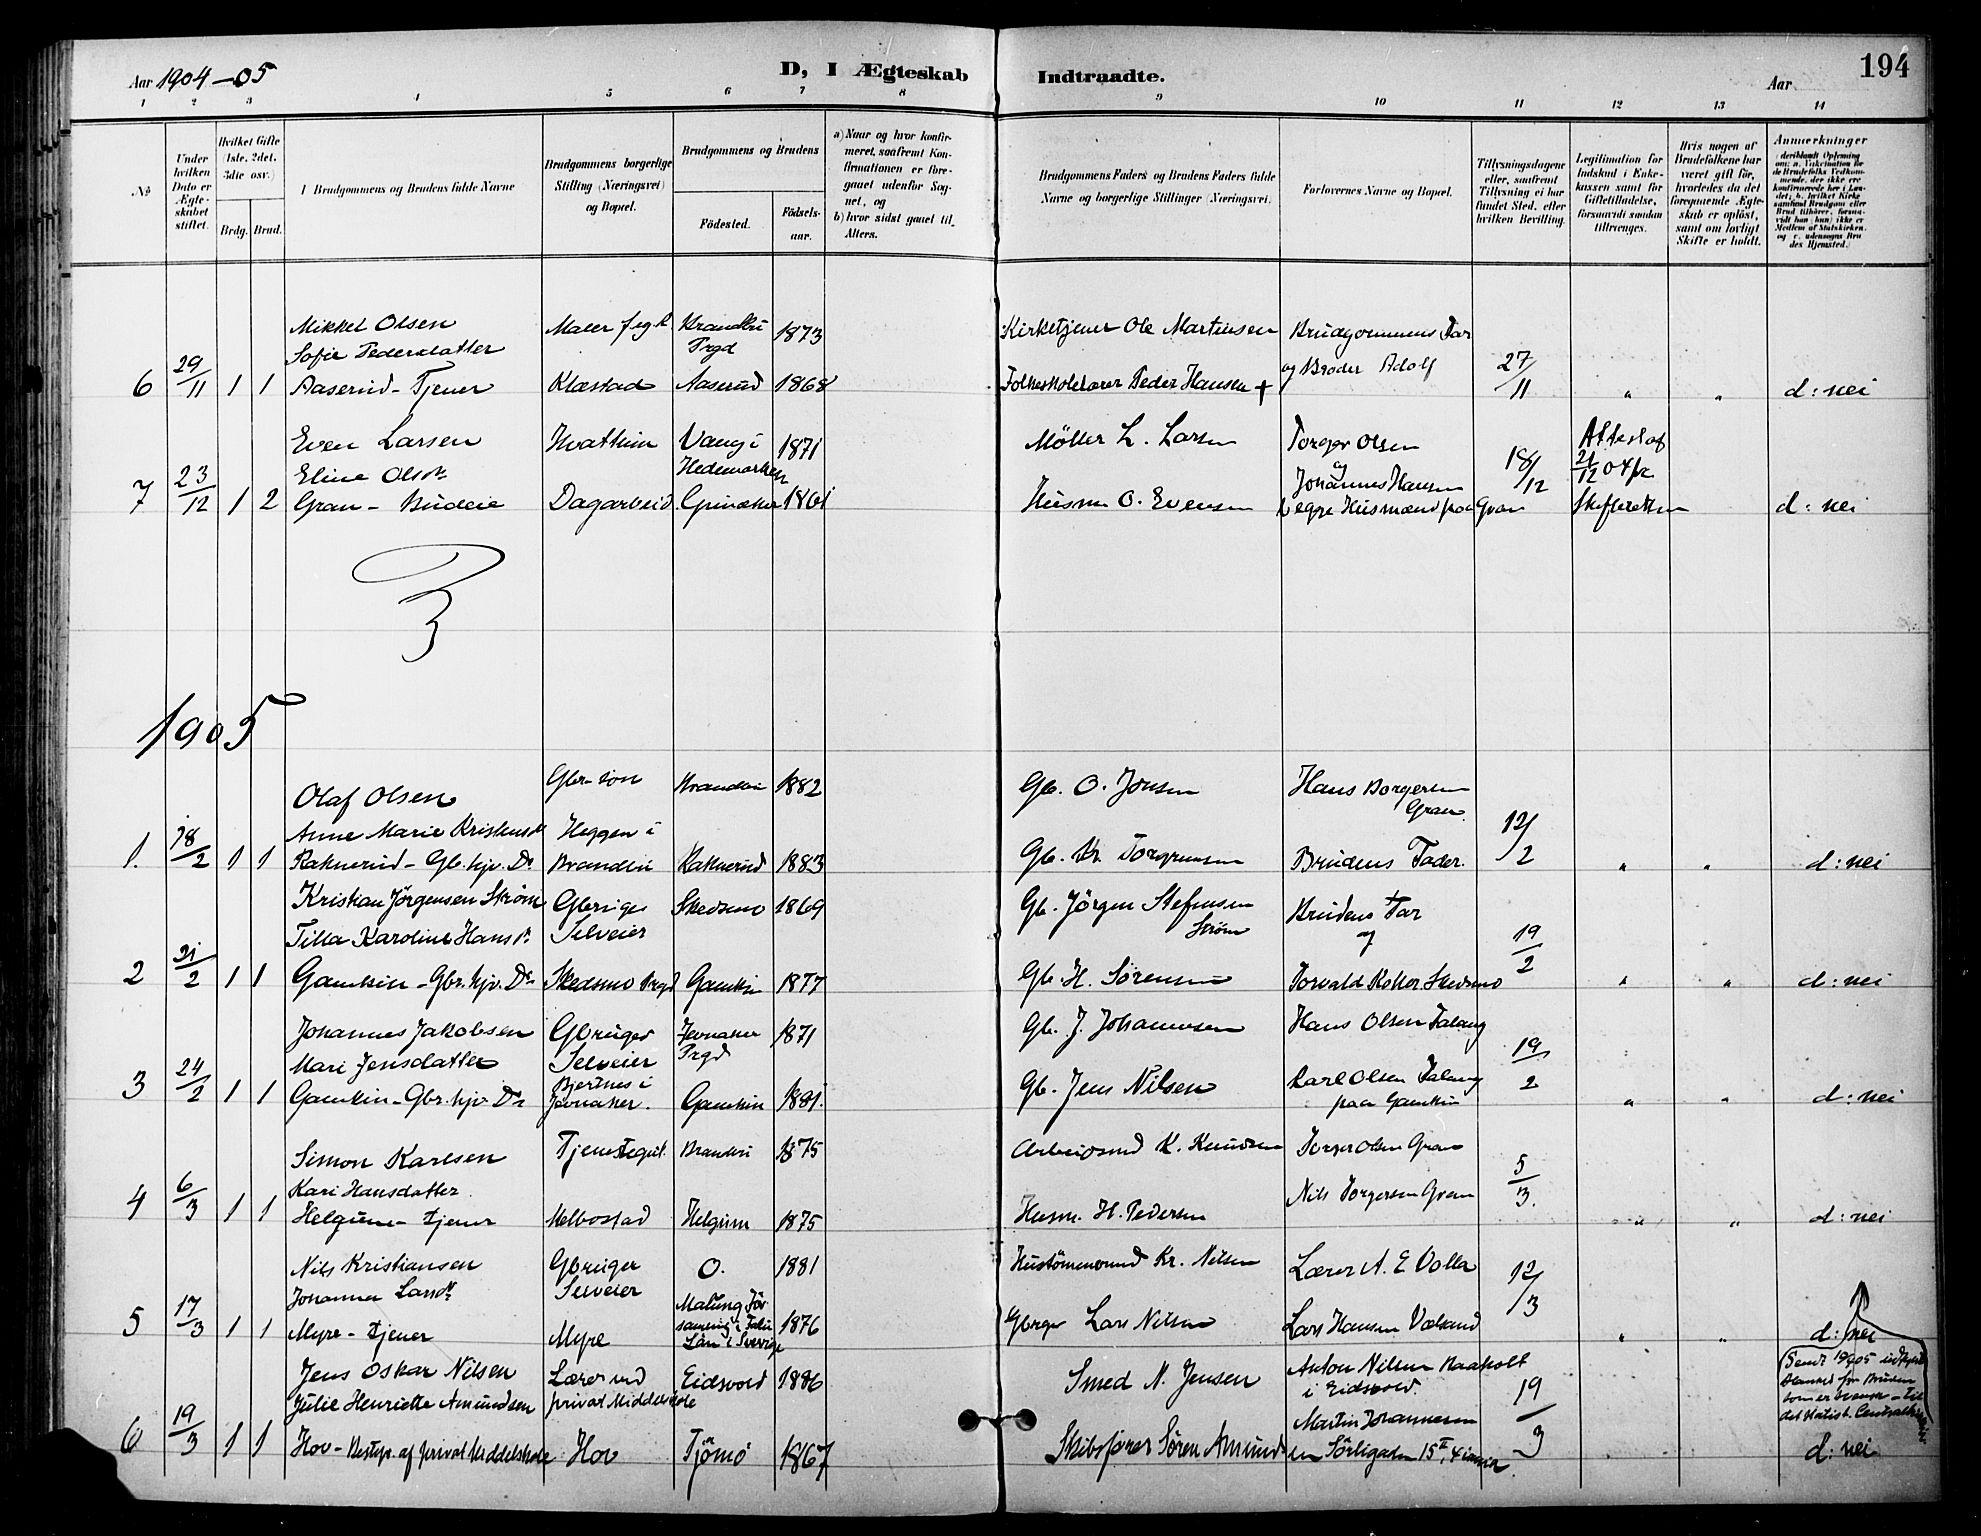 SAH, Gran prestekontor, Ministerialbok nr. 19, 1898-1907, s. 194